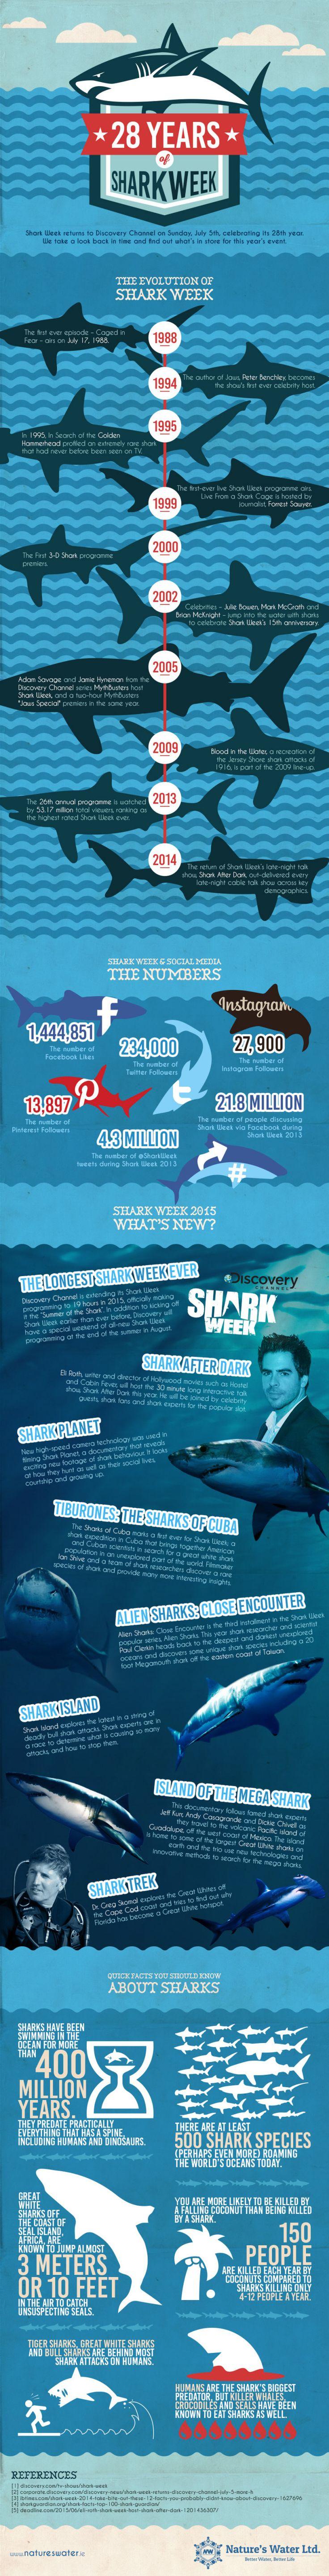 Design muse shark week - 28 Years Of Shark Week Infographic